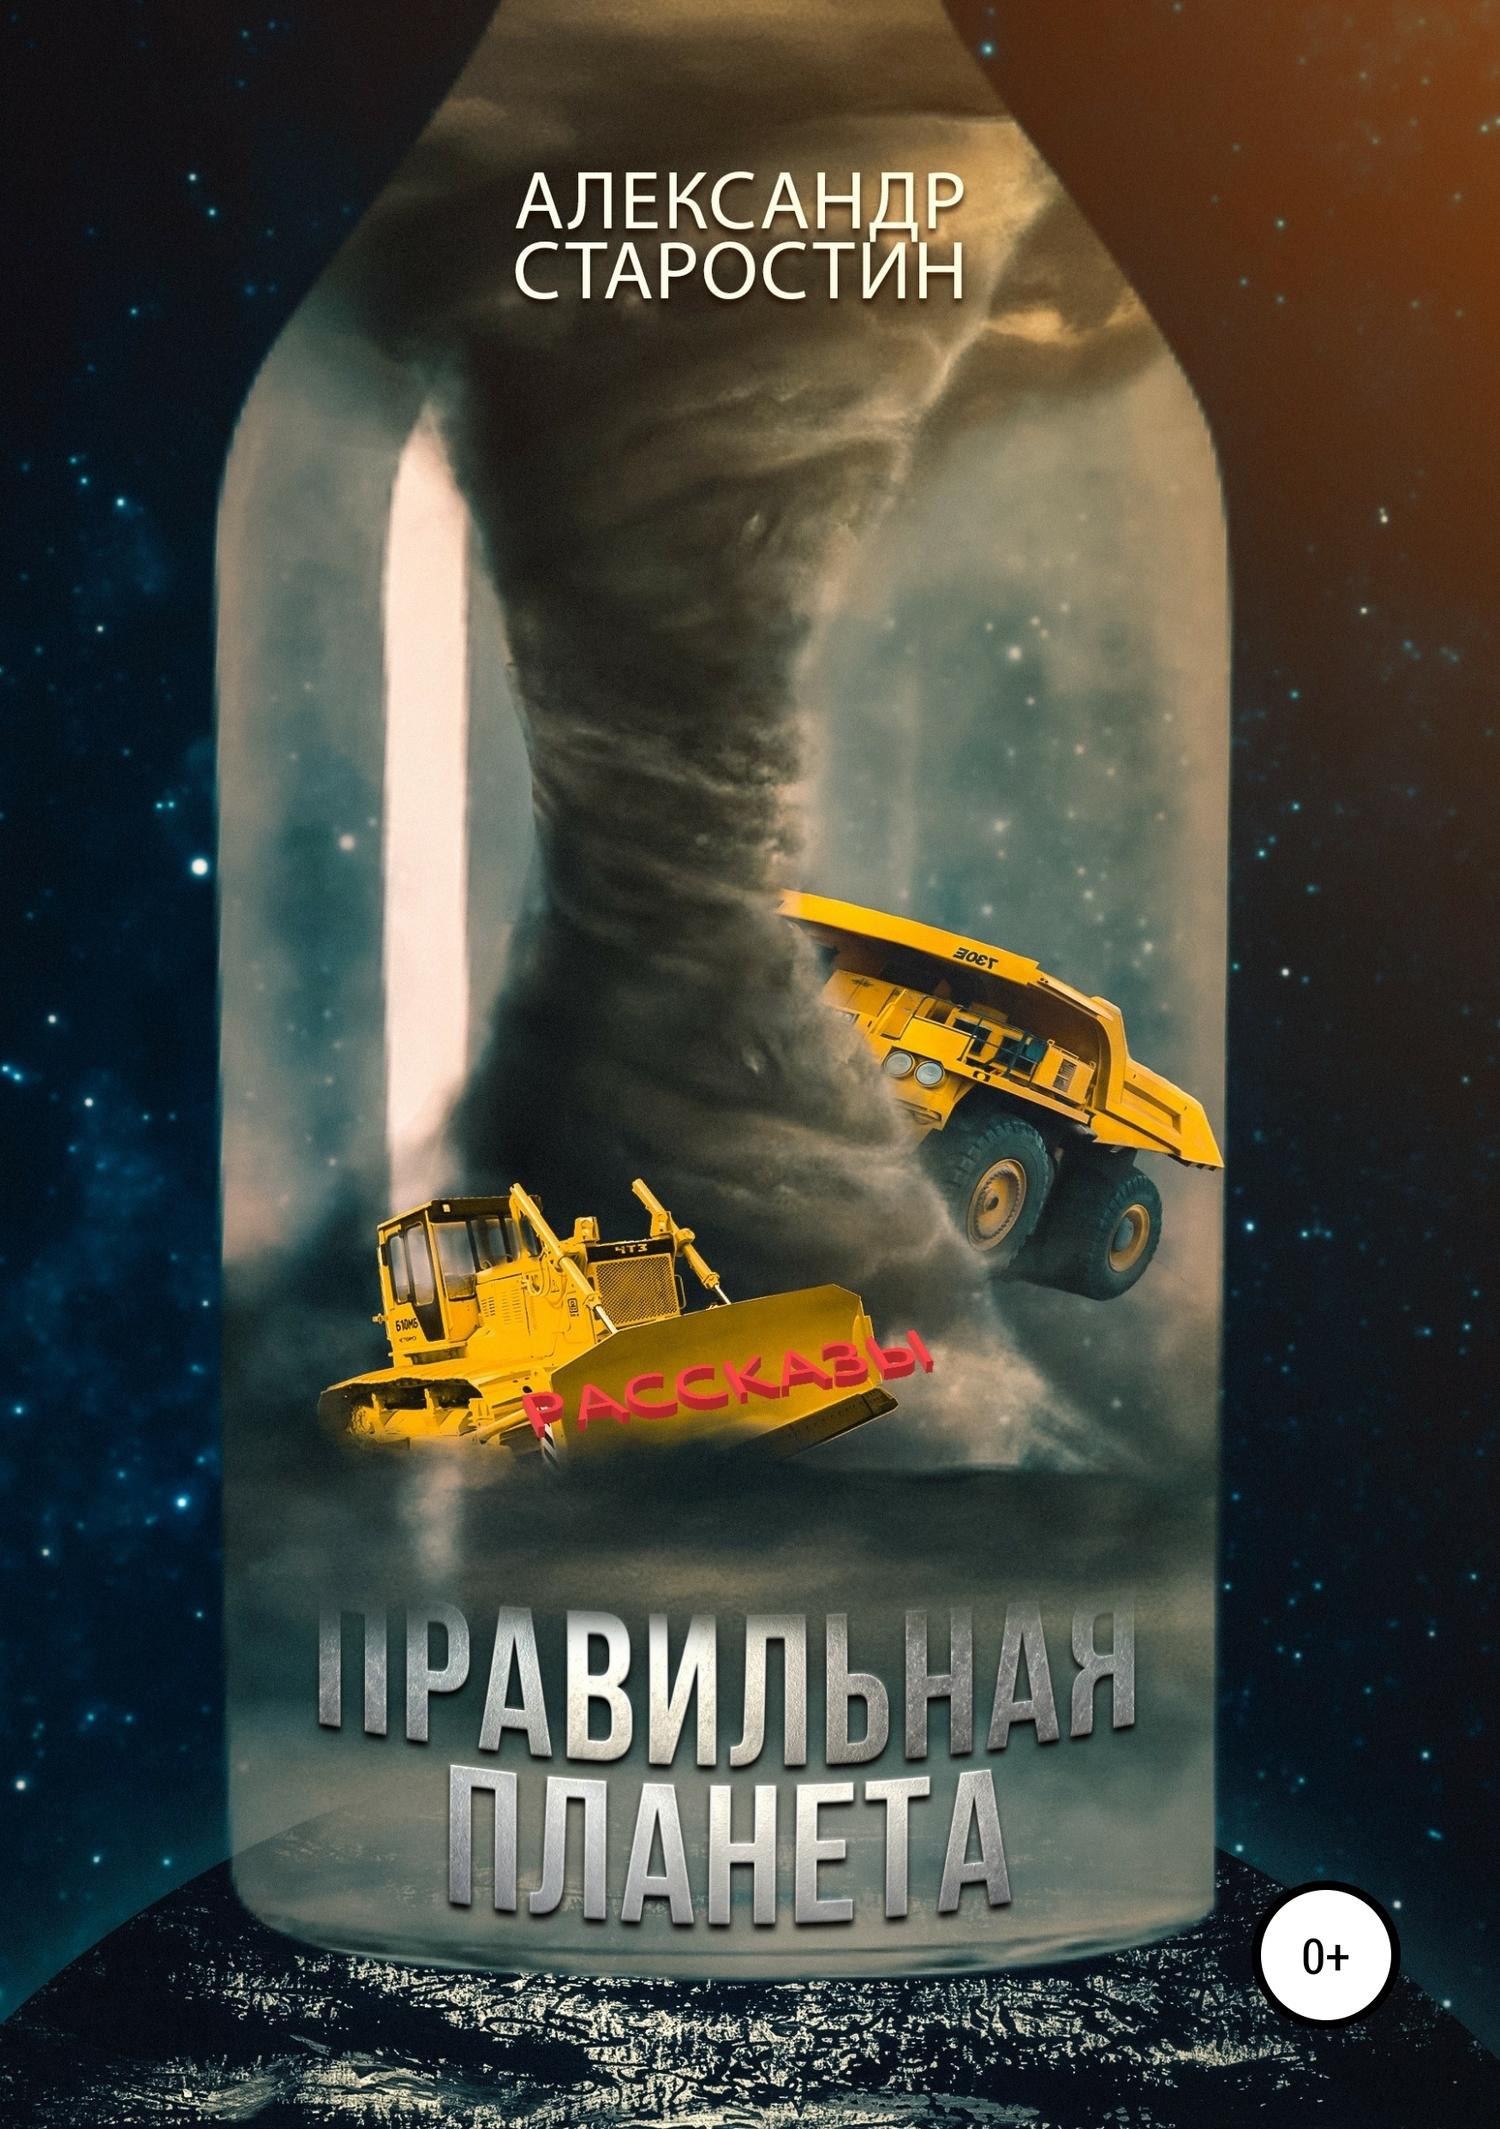 Александр Старостин, Andrew Max - Правильная планета